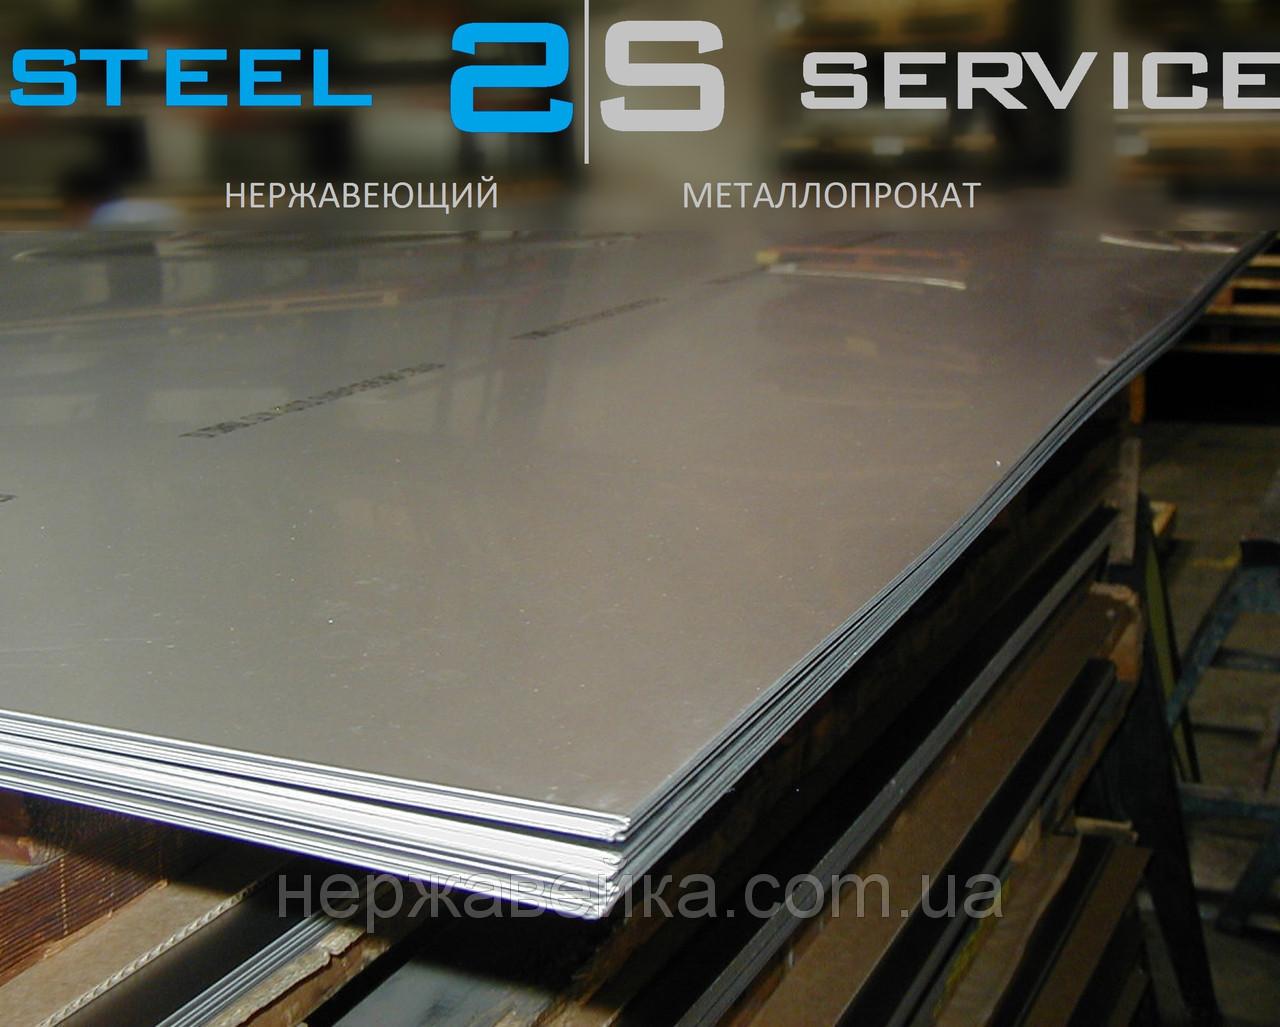 Нержавеющий лист 0,8х1000х2000мм  AISI 316Ti(10Х17Н13М2Т) 4N - шлифованный,  кислотостойкий